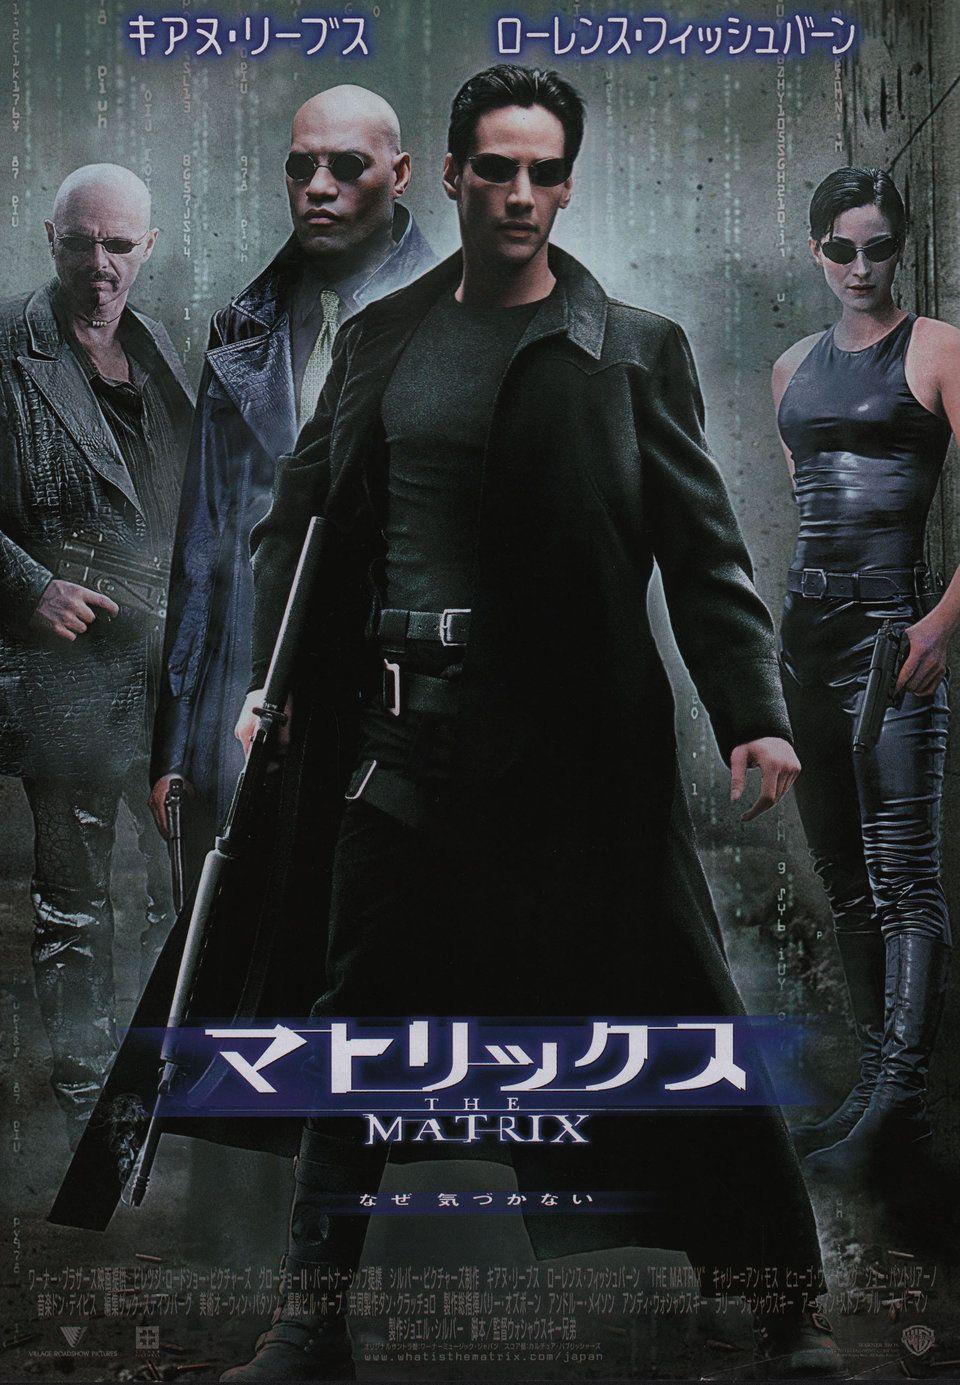 The Matrix 1999 Japanese B5 Chirashi Flyer Posteritati Movie